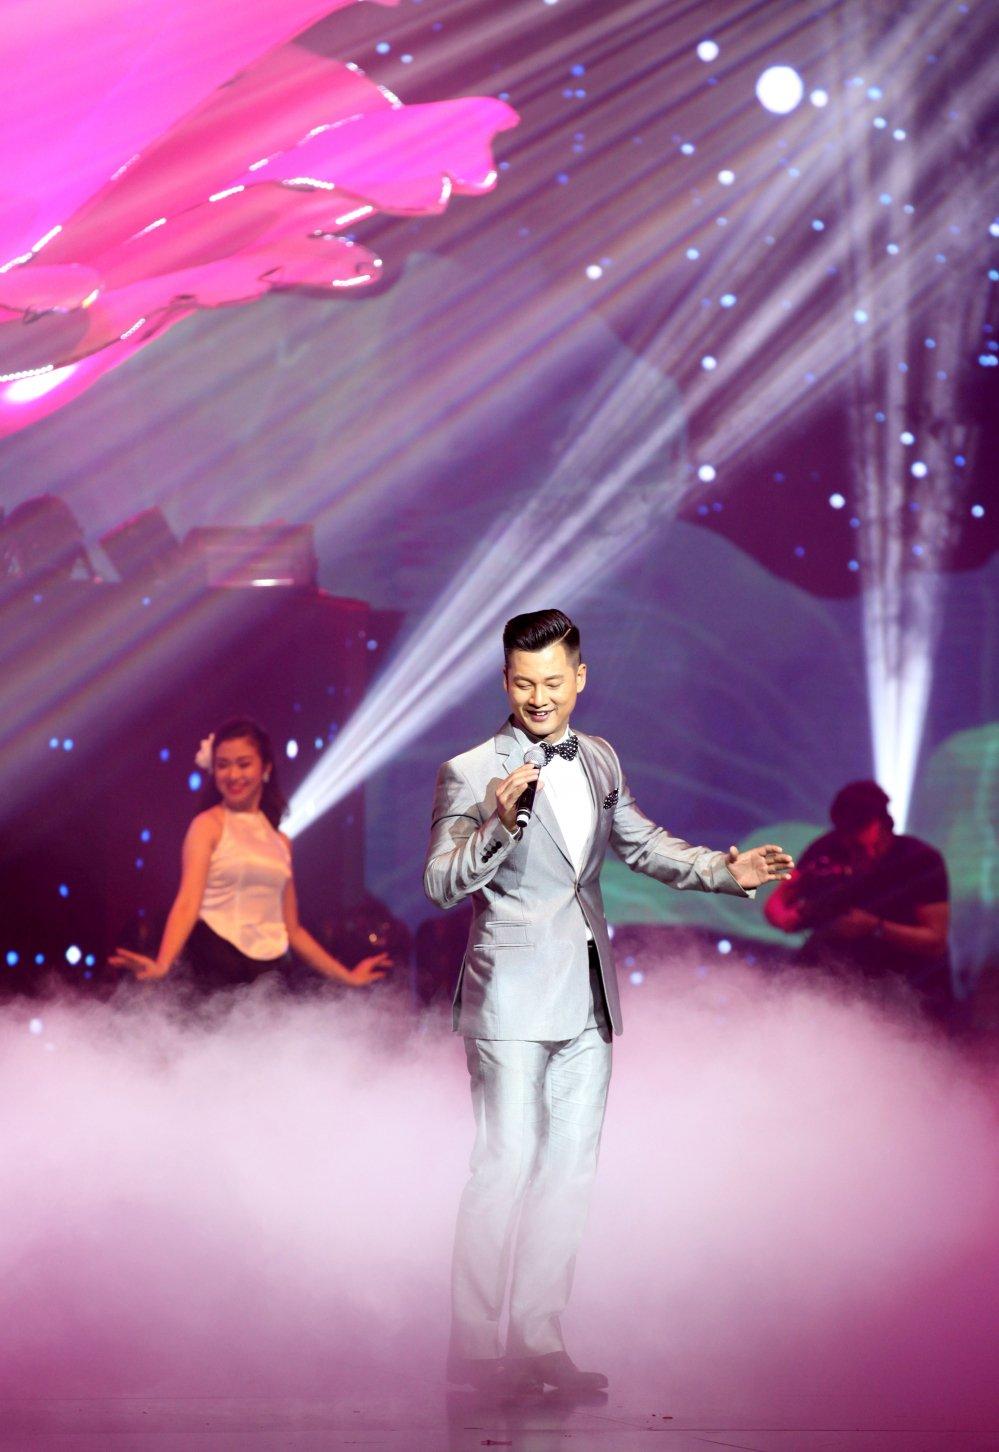 Hong Nhung, Tung Duong thang hoa trong dem nhac 'Nhu nhung doa hoa' hinh anh 12